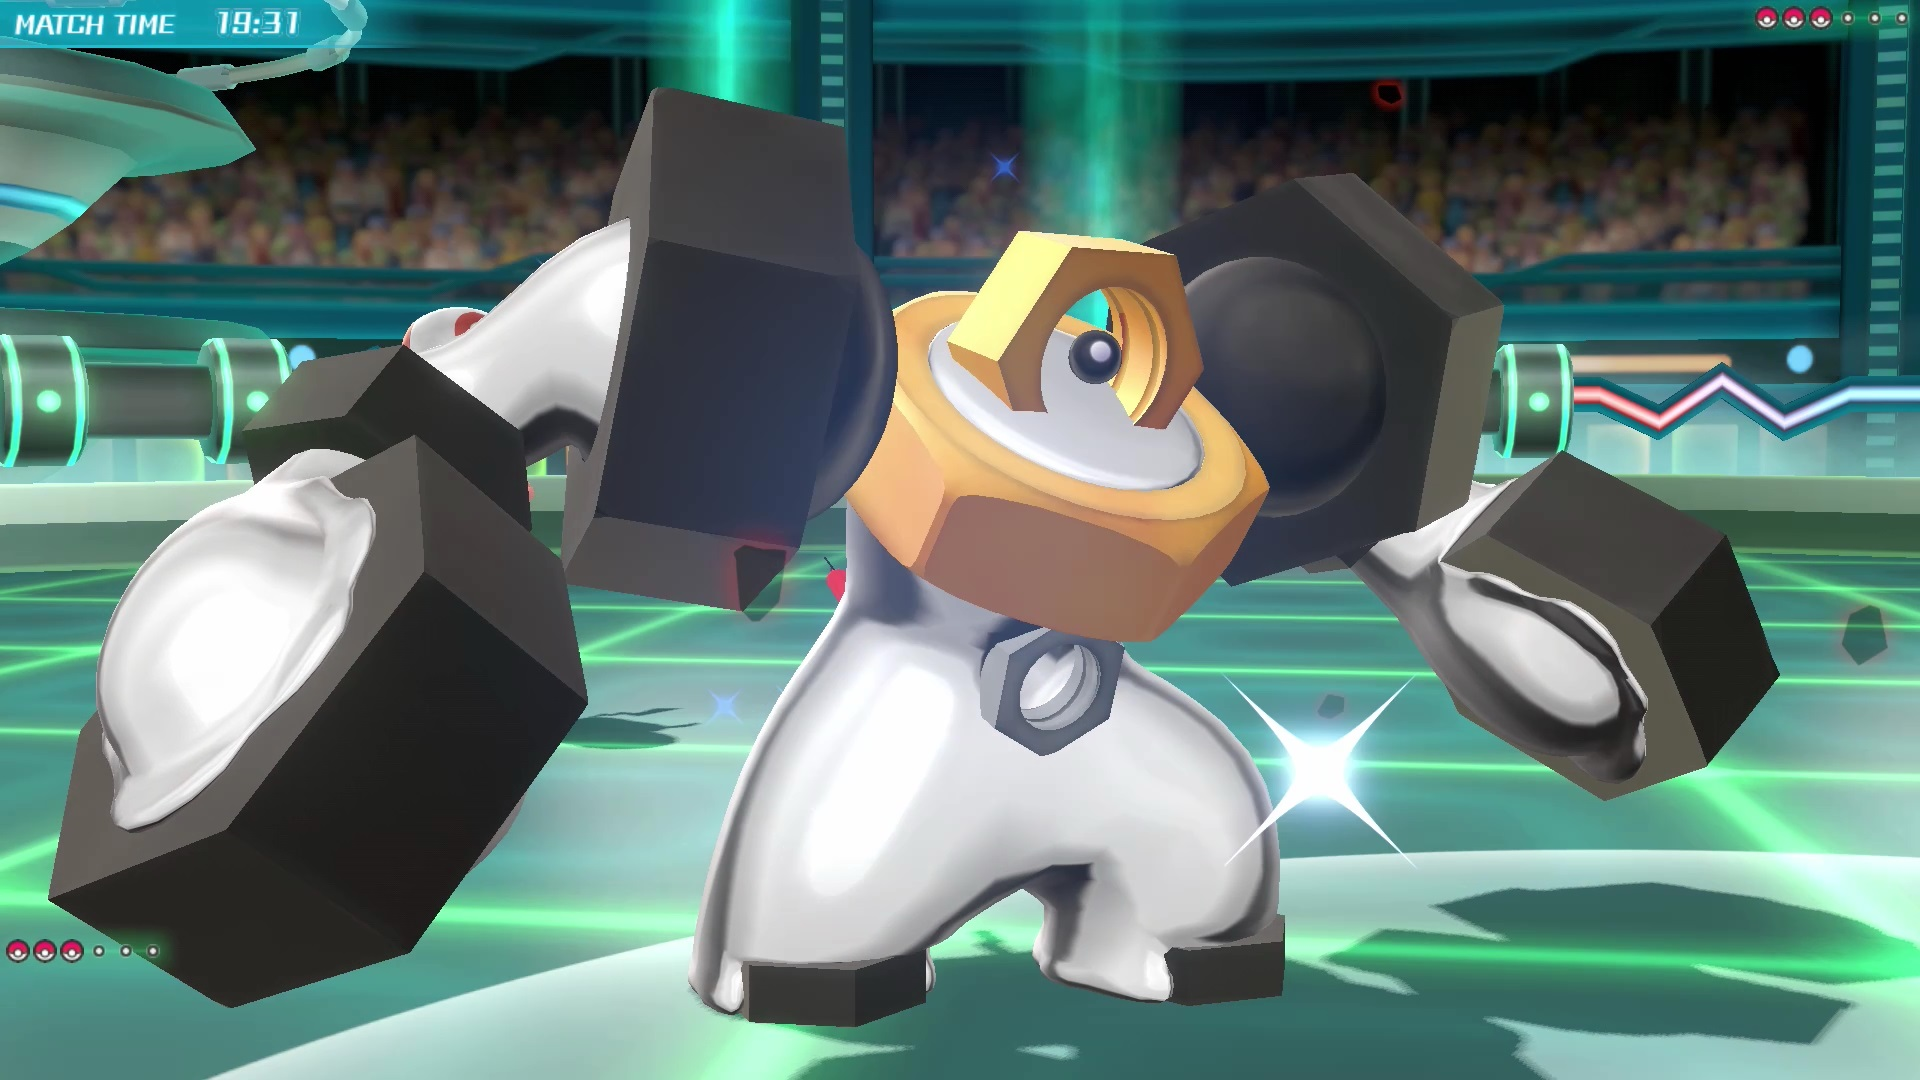 db168951d4b8 Pokémon  Let s Go! legendary Meltan s evolution revealed - Polygon